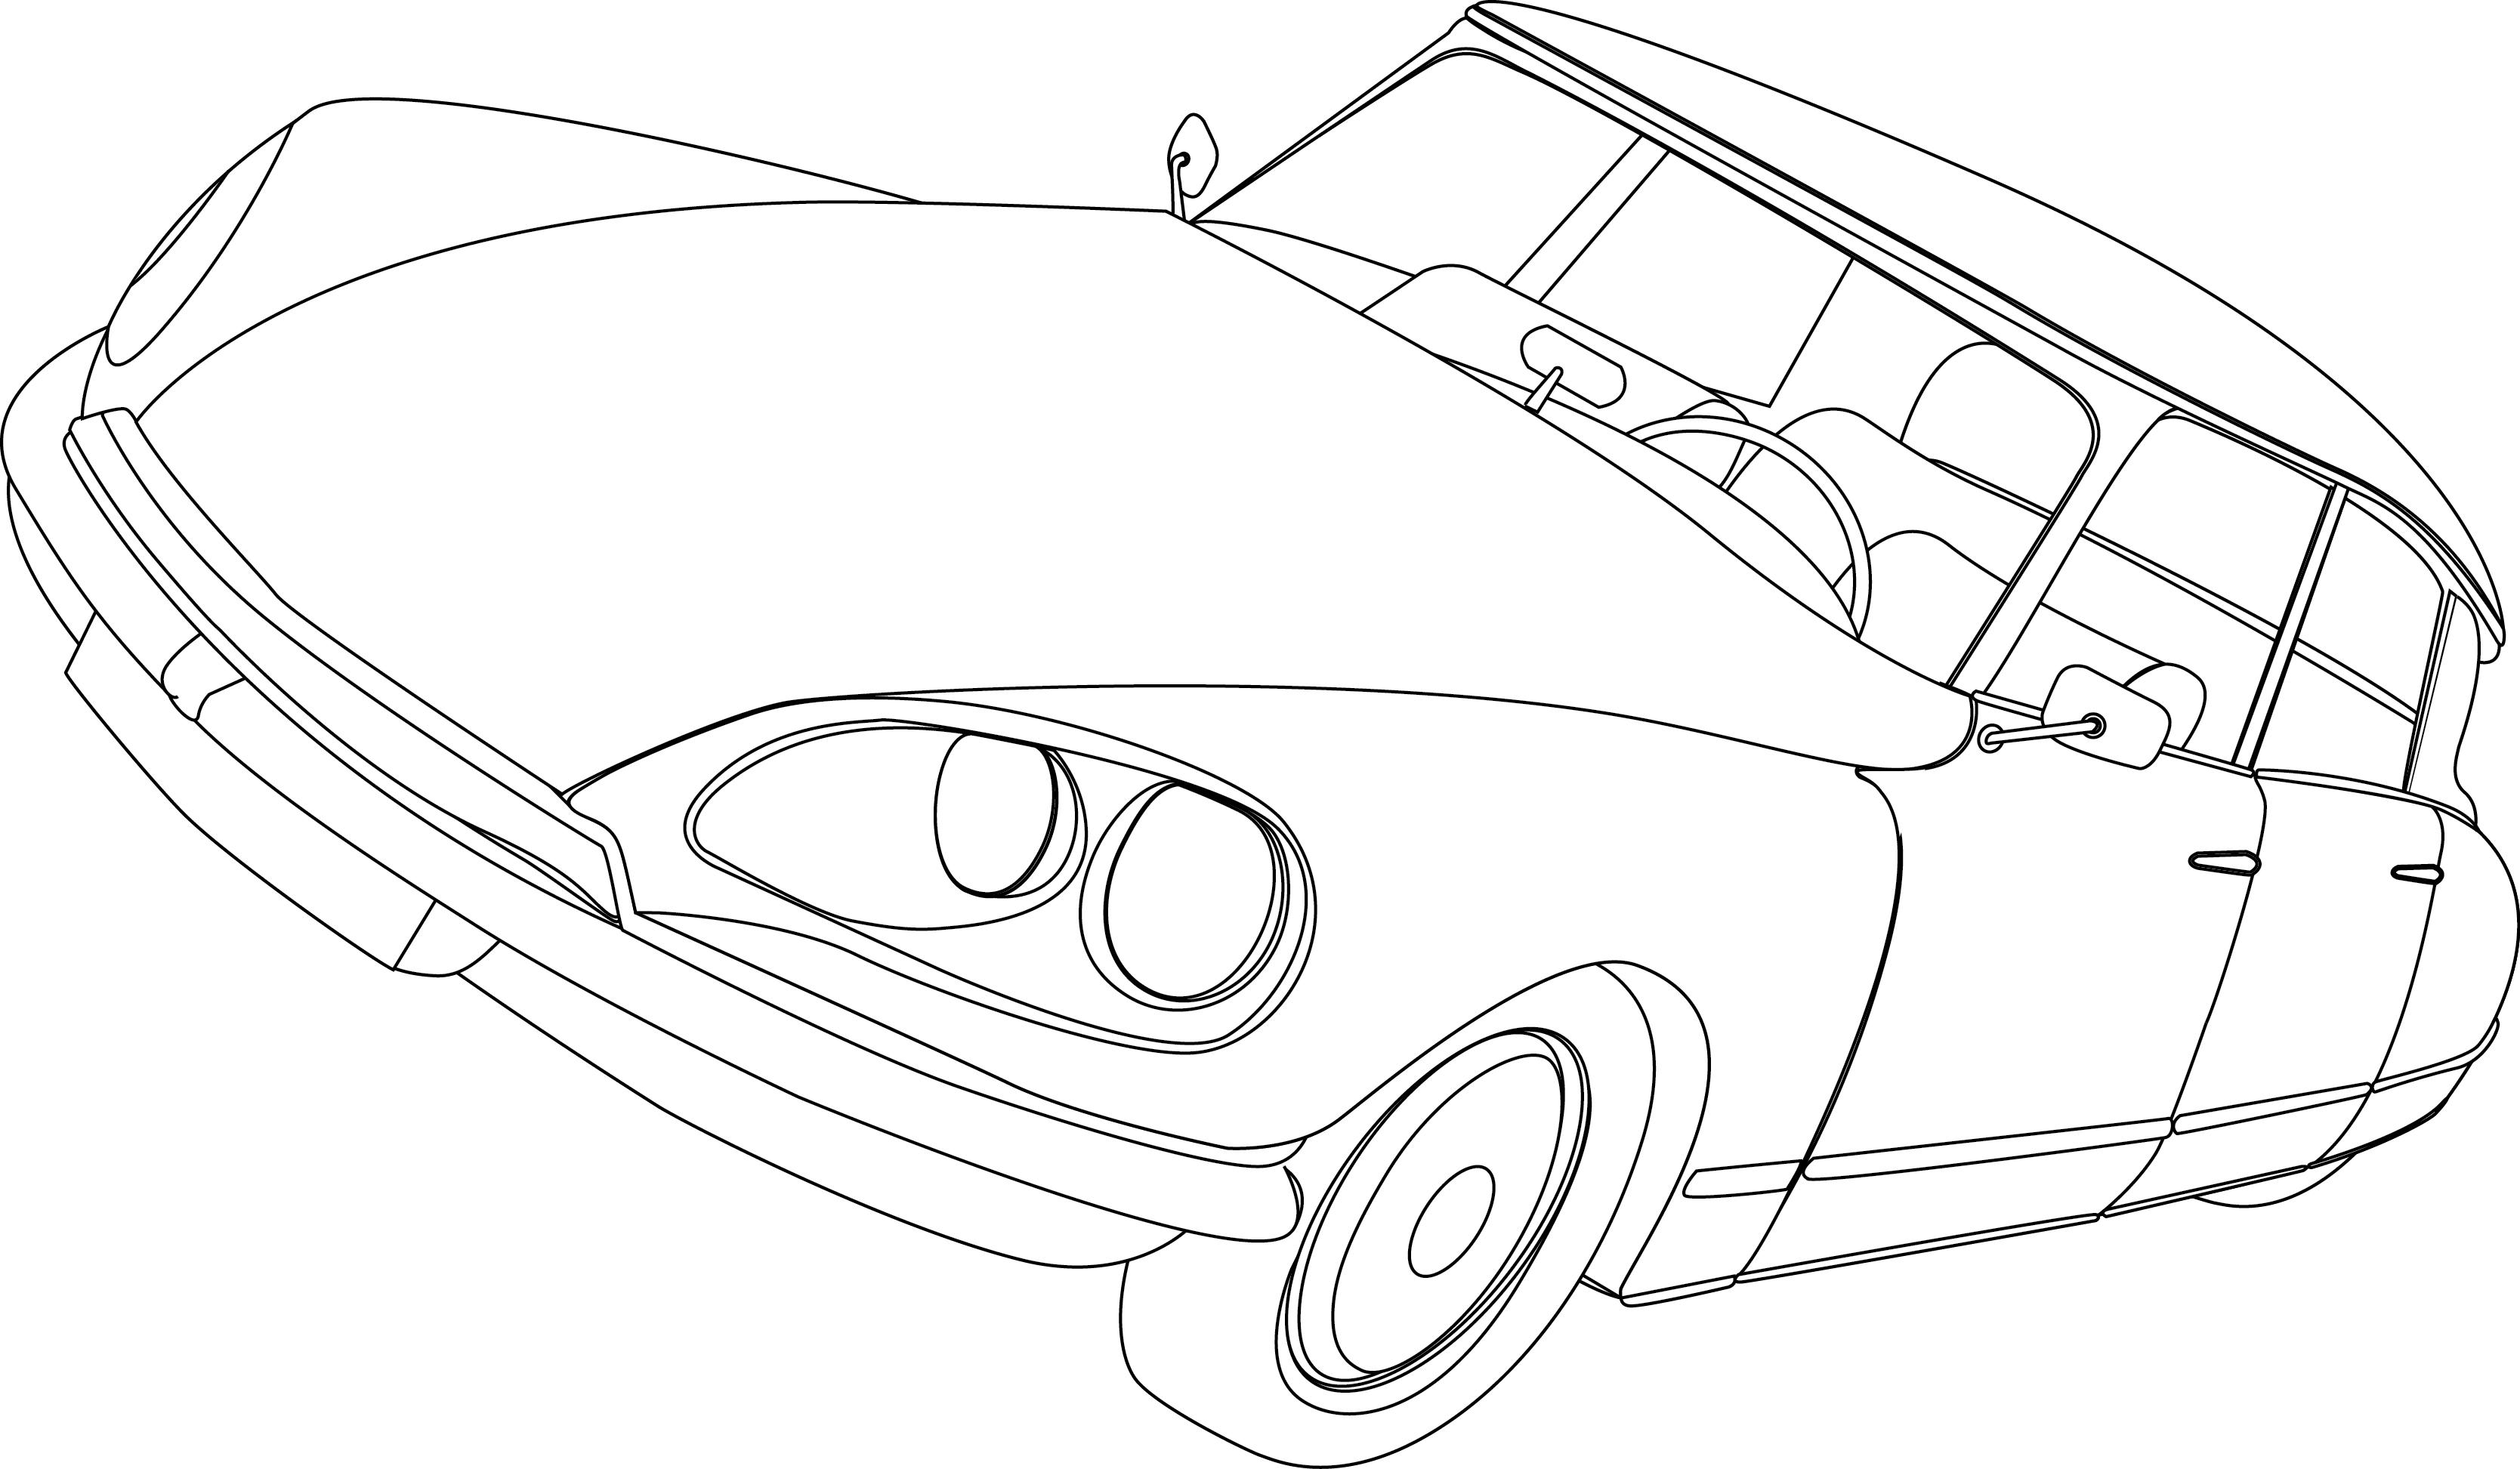 1969 citroen ds pallas illustration hmmmm could be quite a nice Ferari Sports Car 1969 citroen ds pallas illustration hmmmm could be quite a nice single line tattoo k